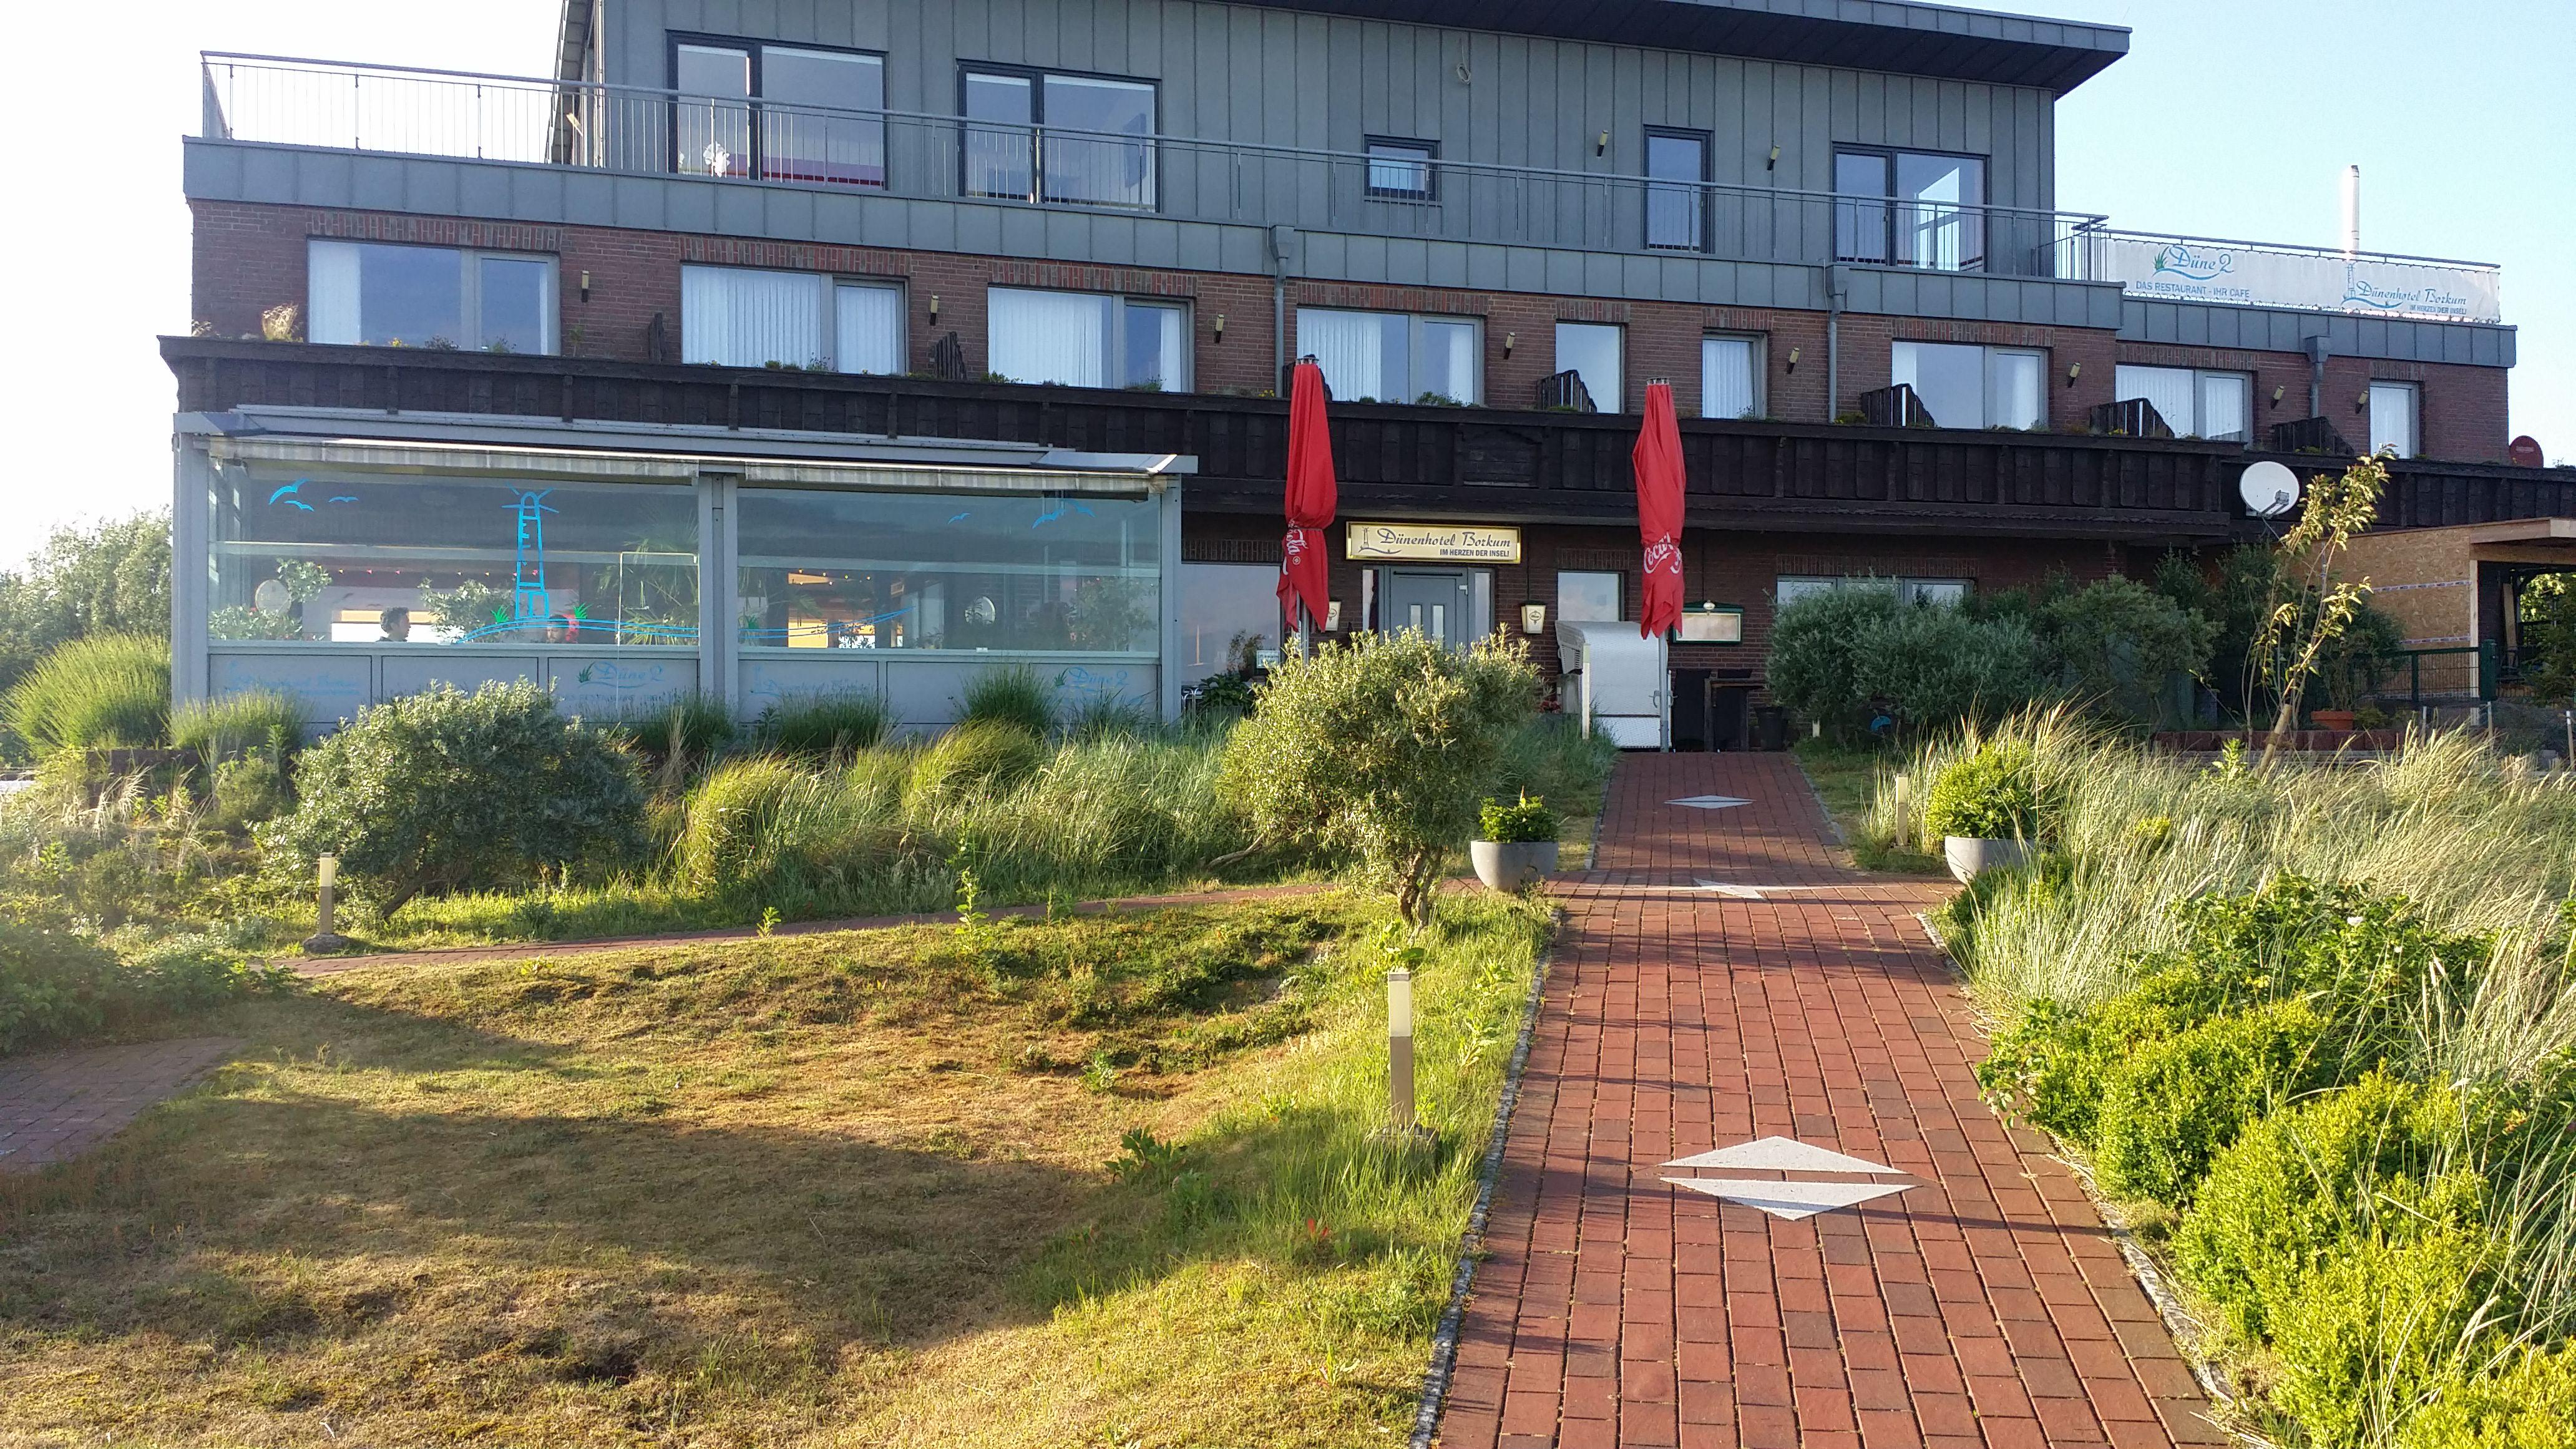 Dünenhotel Borkum in Borkum • HolidayCheck